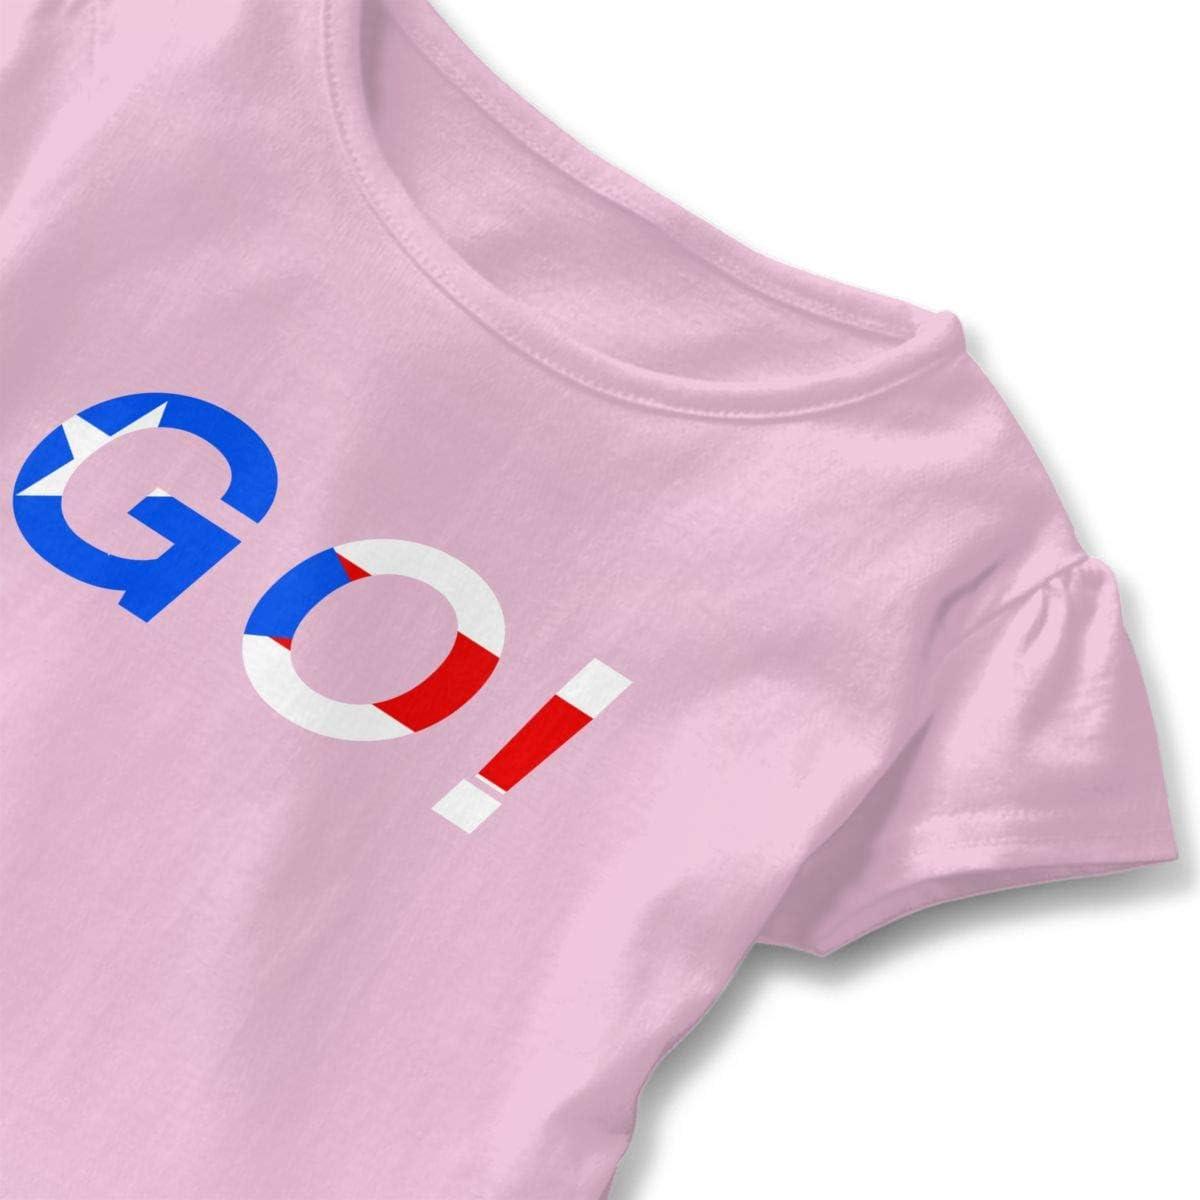 Toddler Baby Girl Puerto Rico Go 100/% Cotton T Shirts Short Sleeve Ruffle Tee Basic Tops